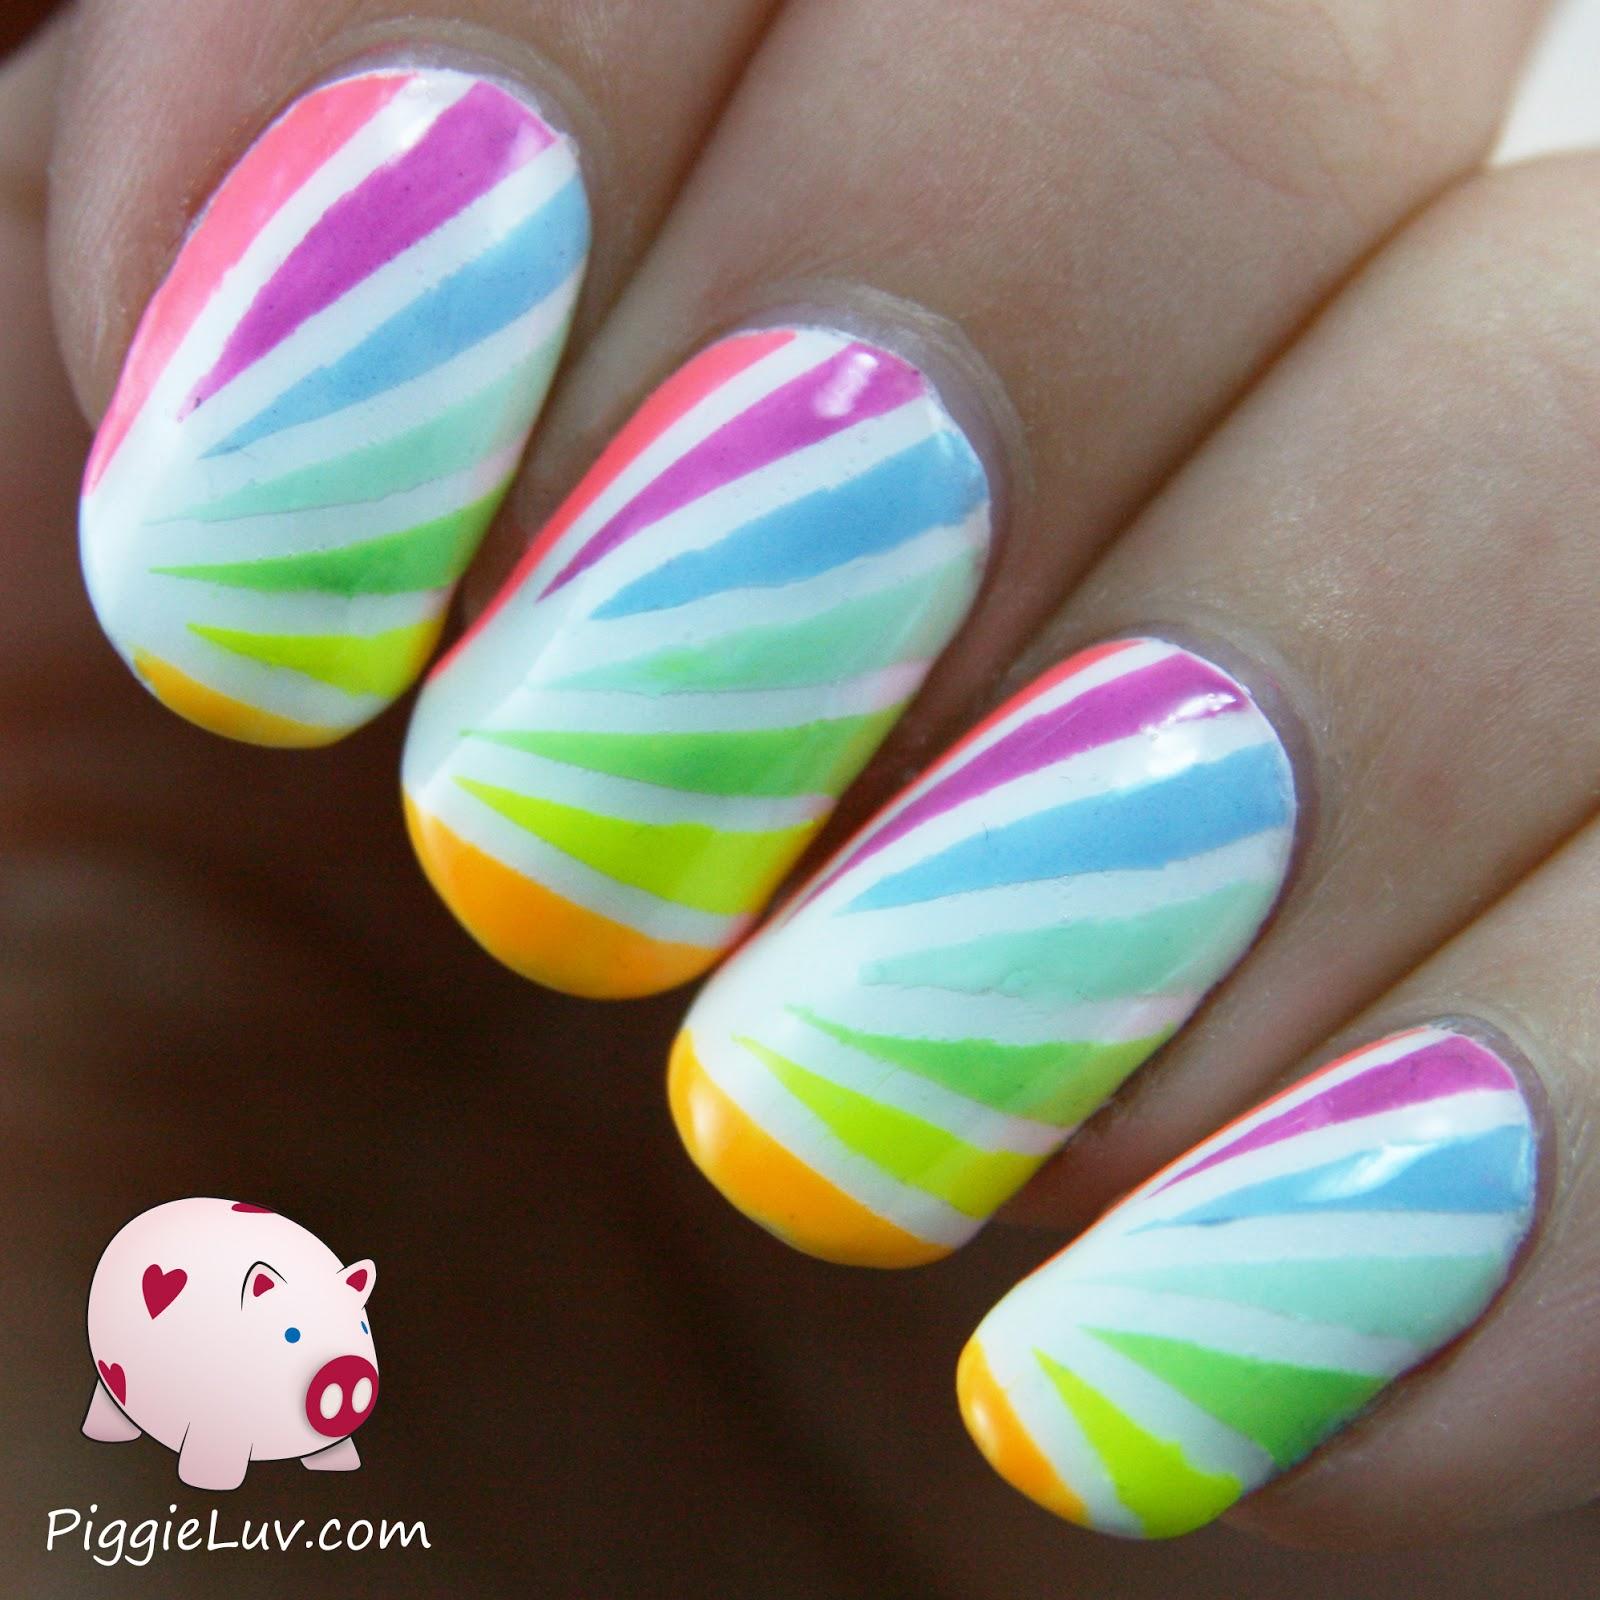 PiggieLuv: Neon rainbow tape mani